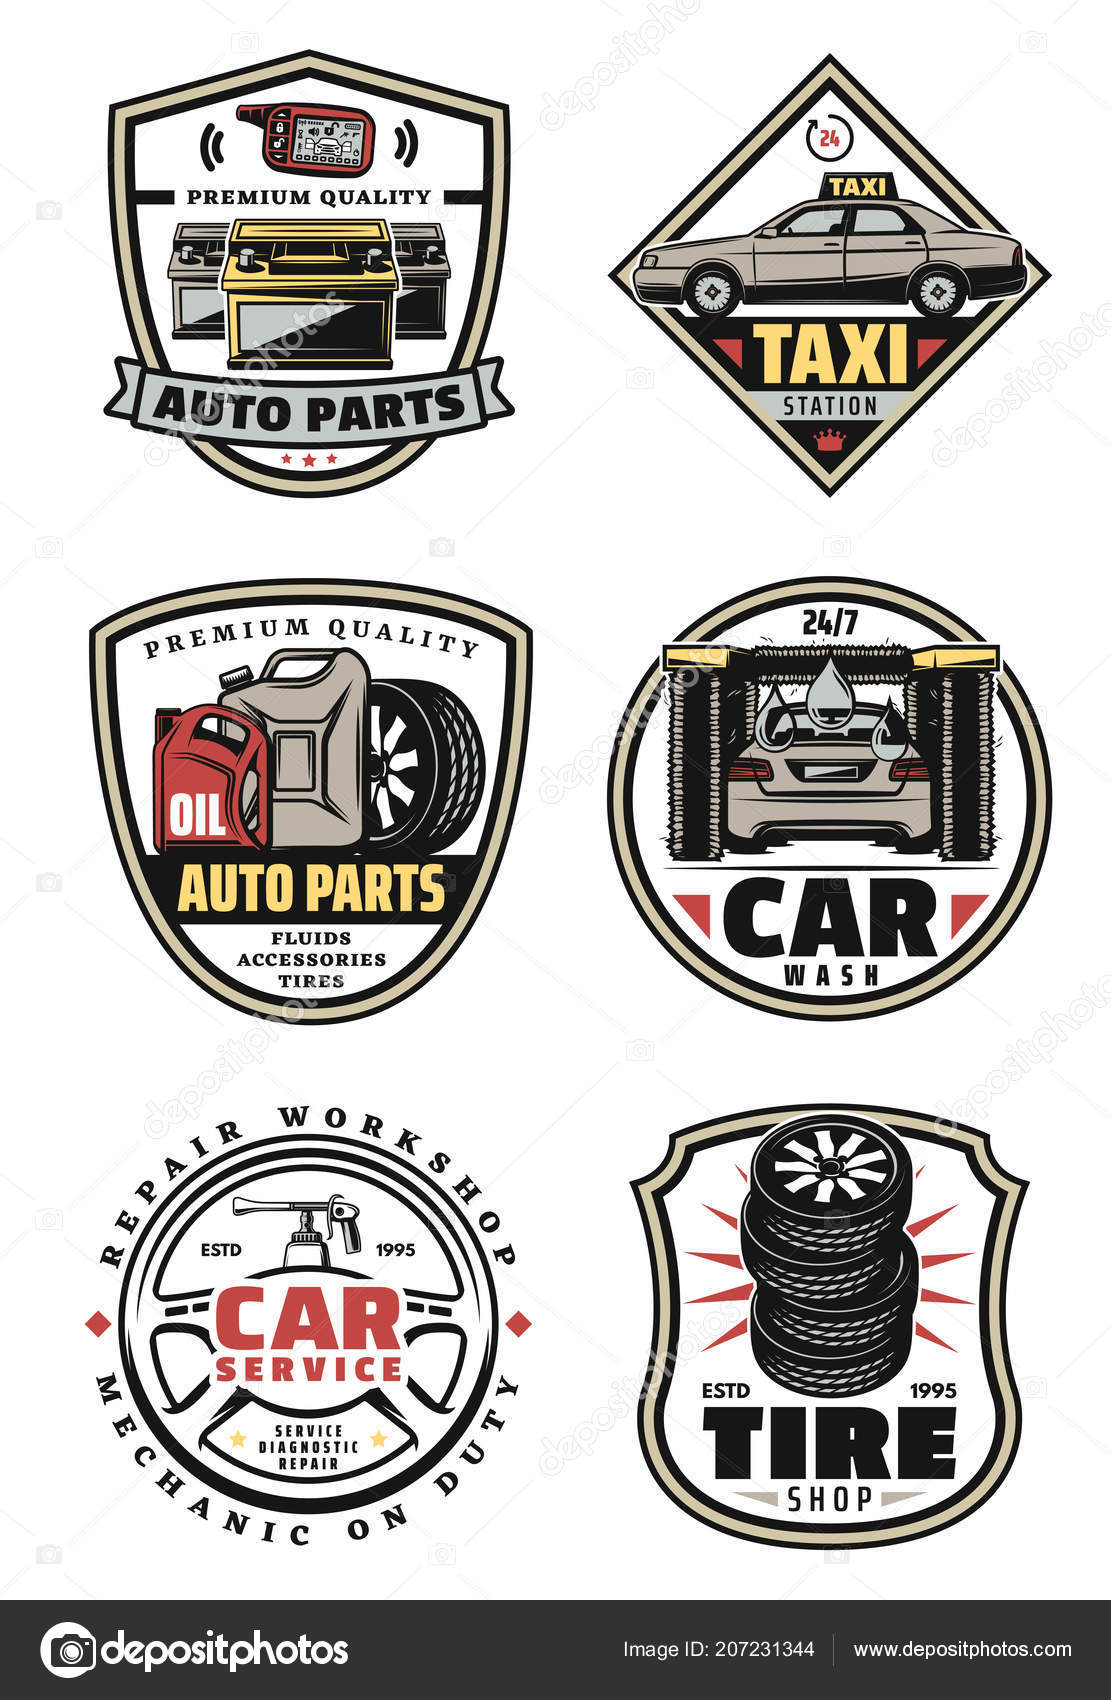 Car Repair Shop And Service Garage Vintage Badges Stock Vector